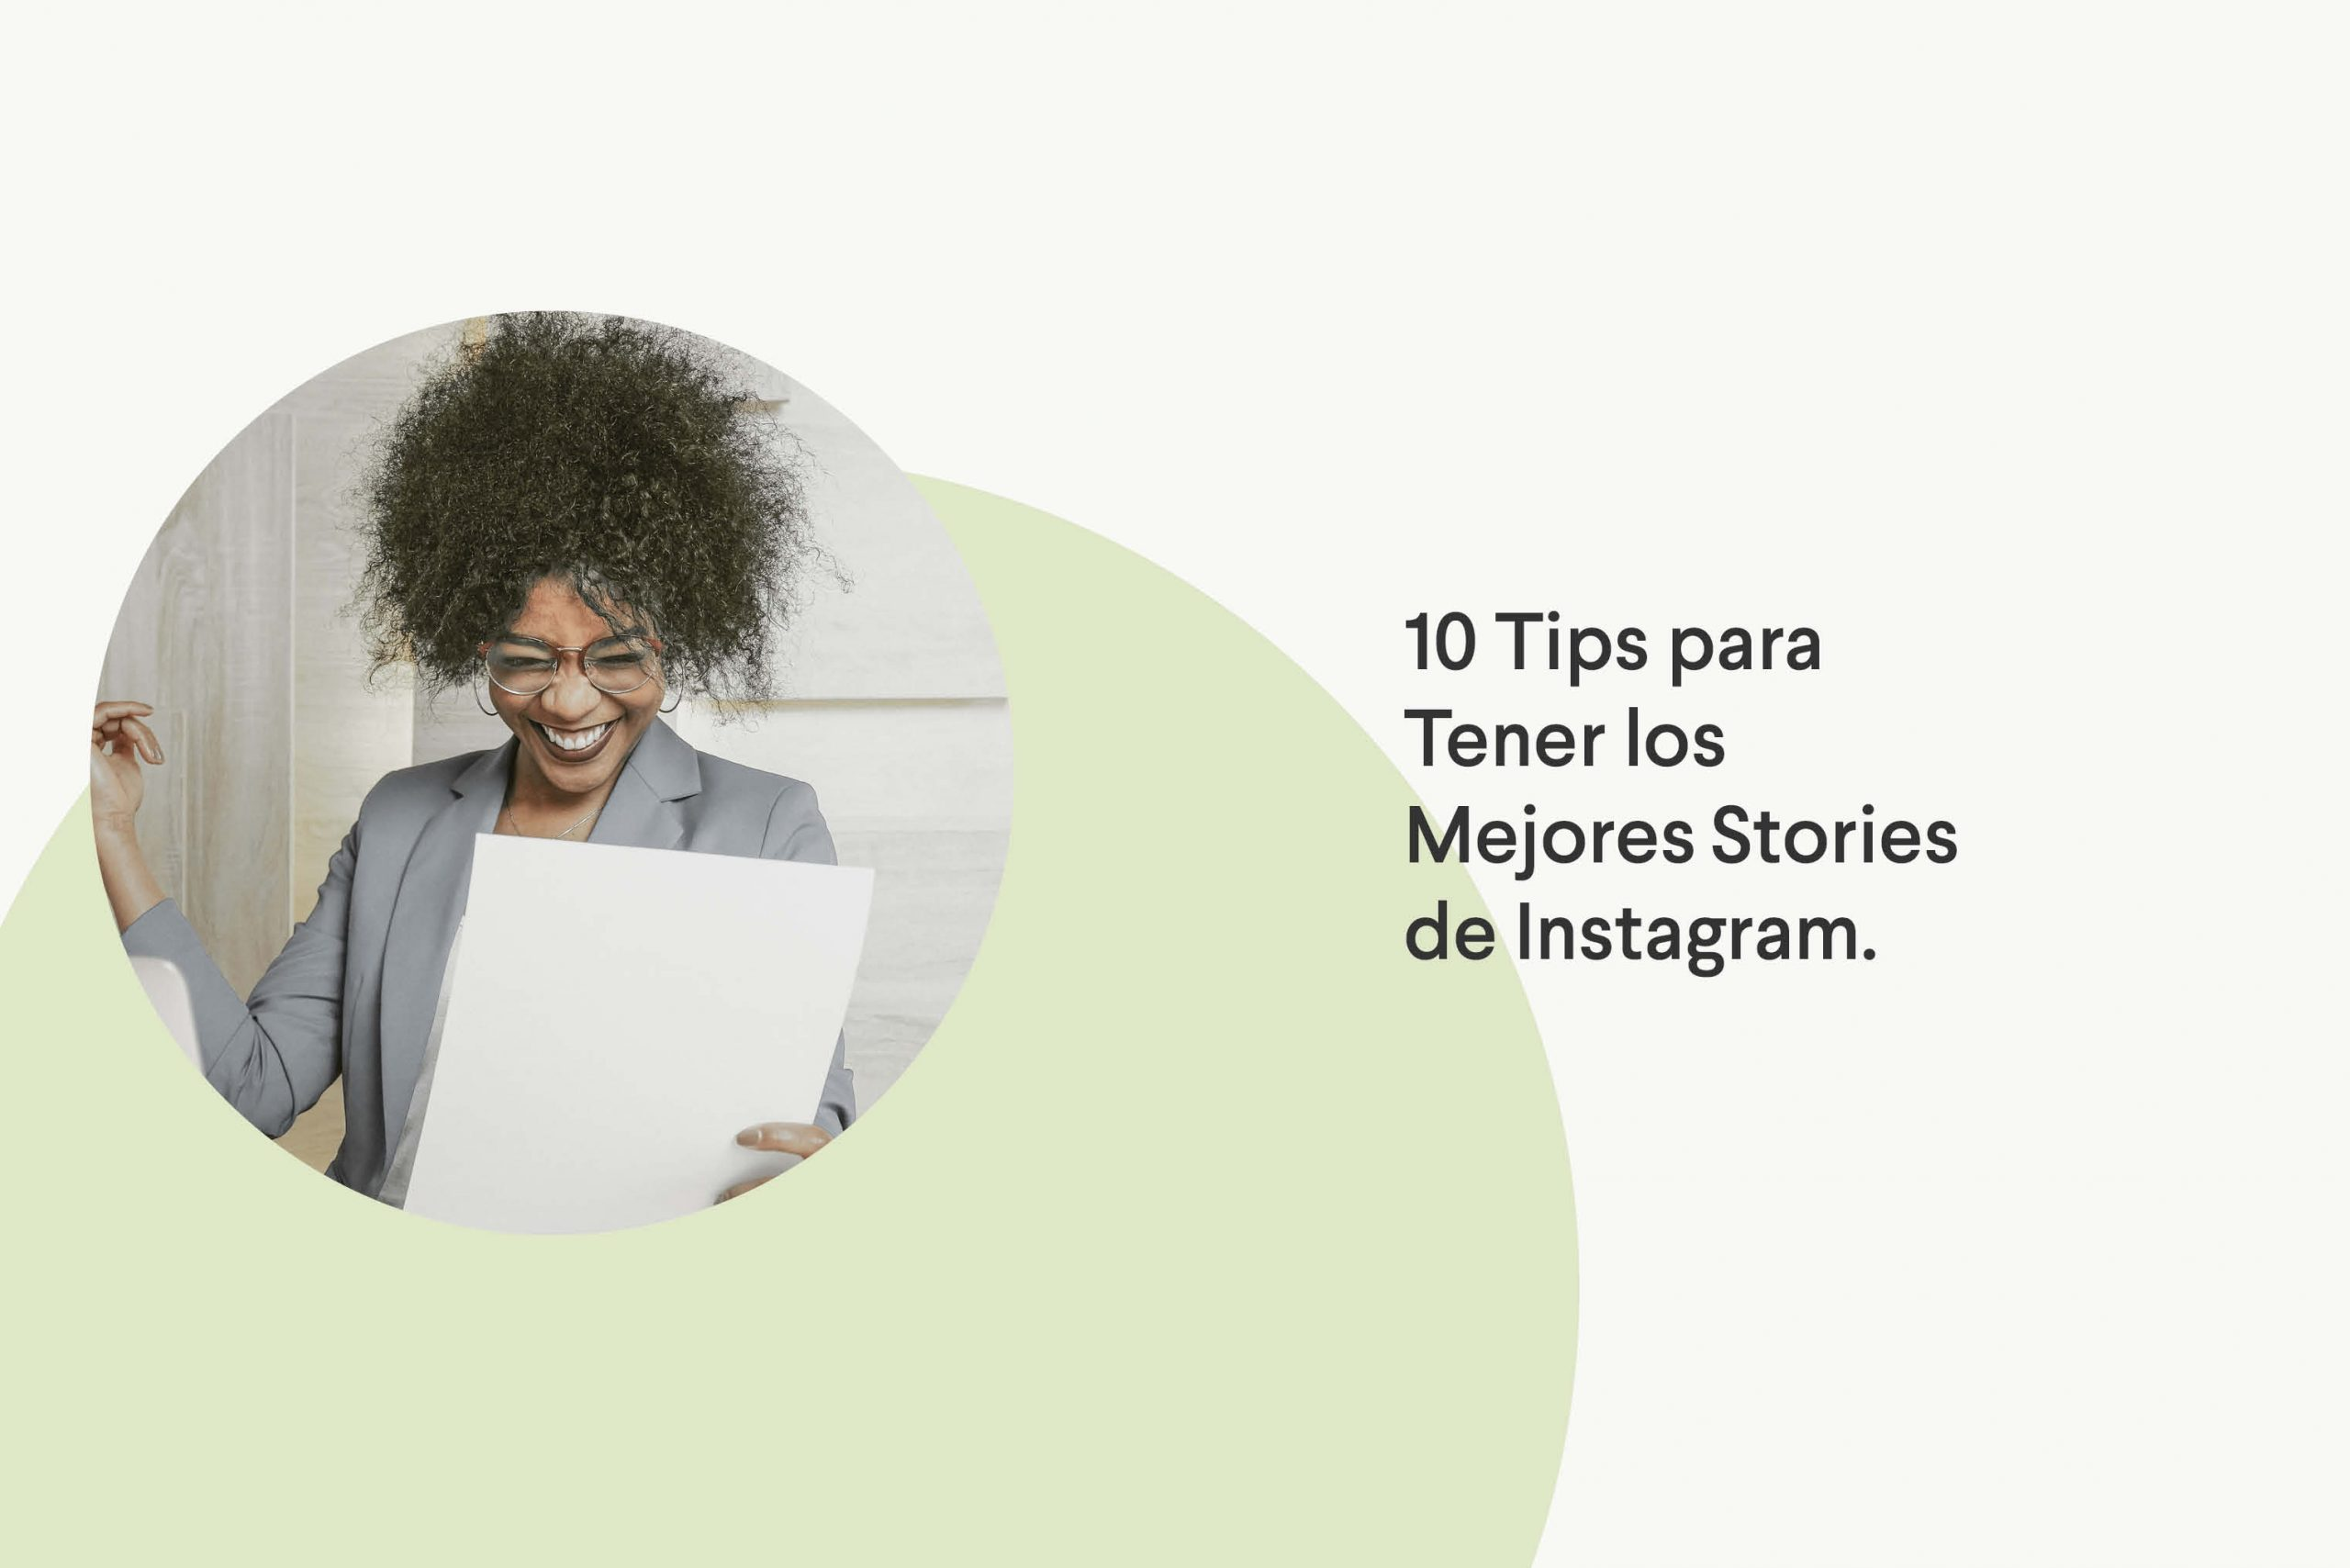 Tips para hacer buenos Instagram Stories